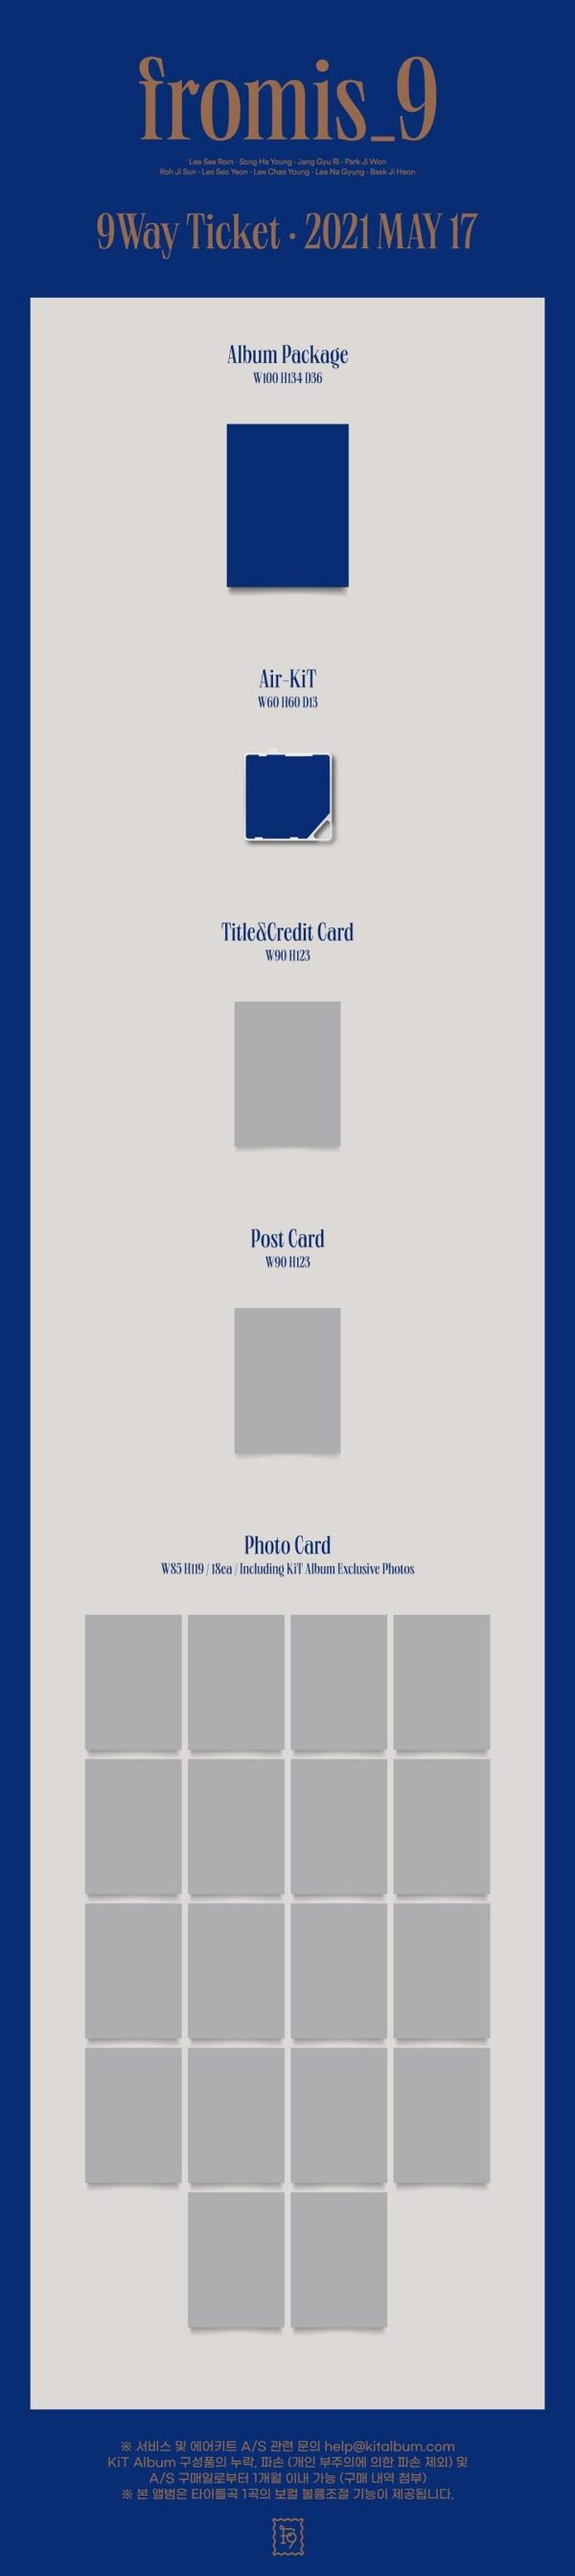 FROMIS 9 2nd Single 9 WAY TICKET Kit Album 1